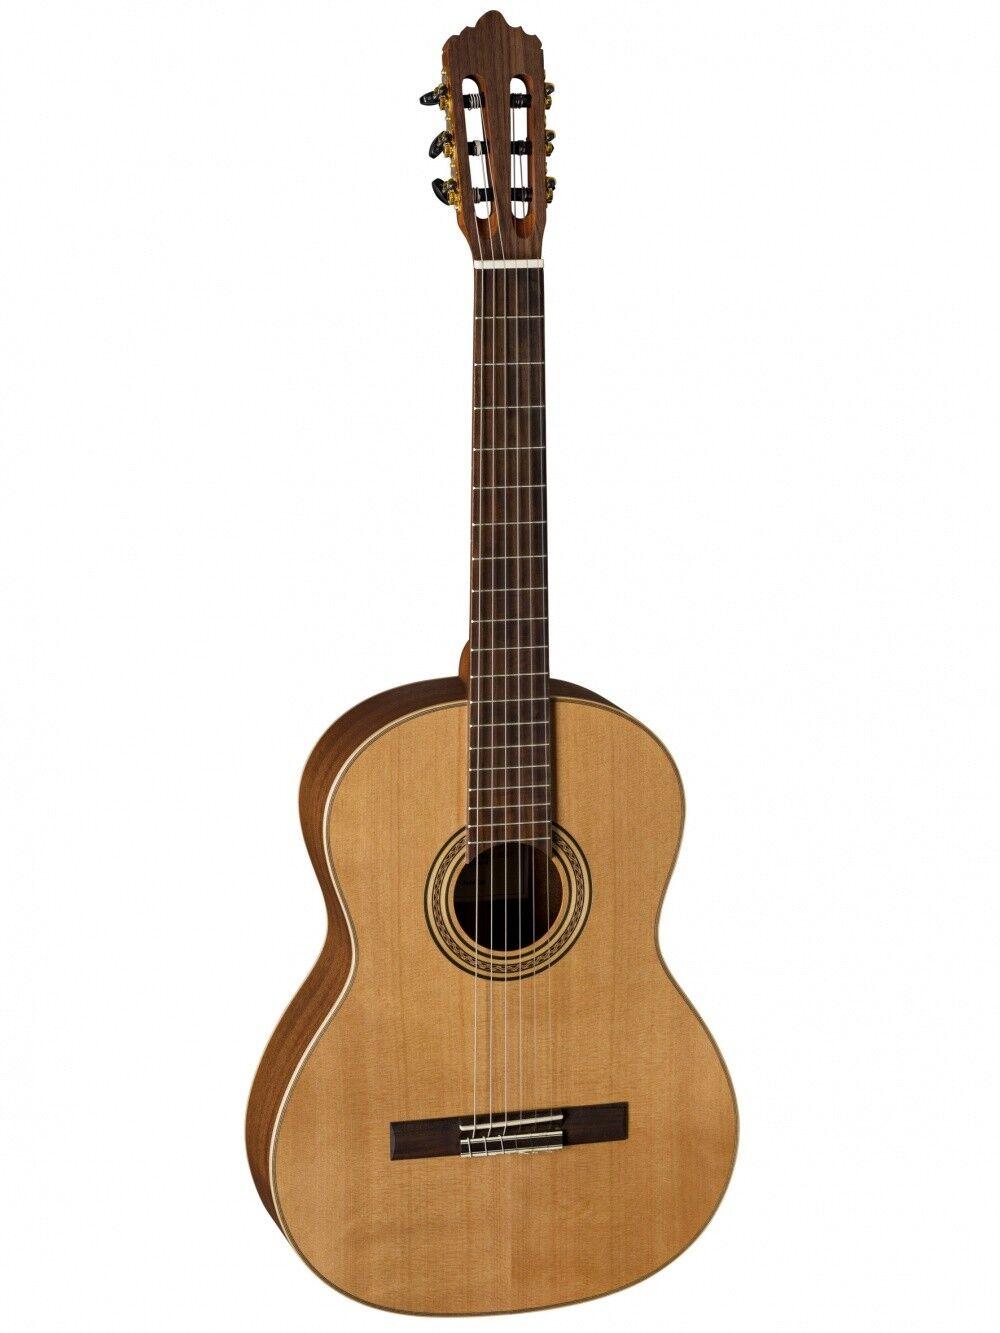 LA MANCHA Rubi CM 63 Konzert Gitarre 7 8 Classic Guitar